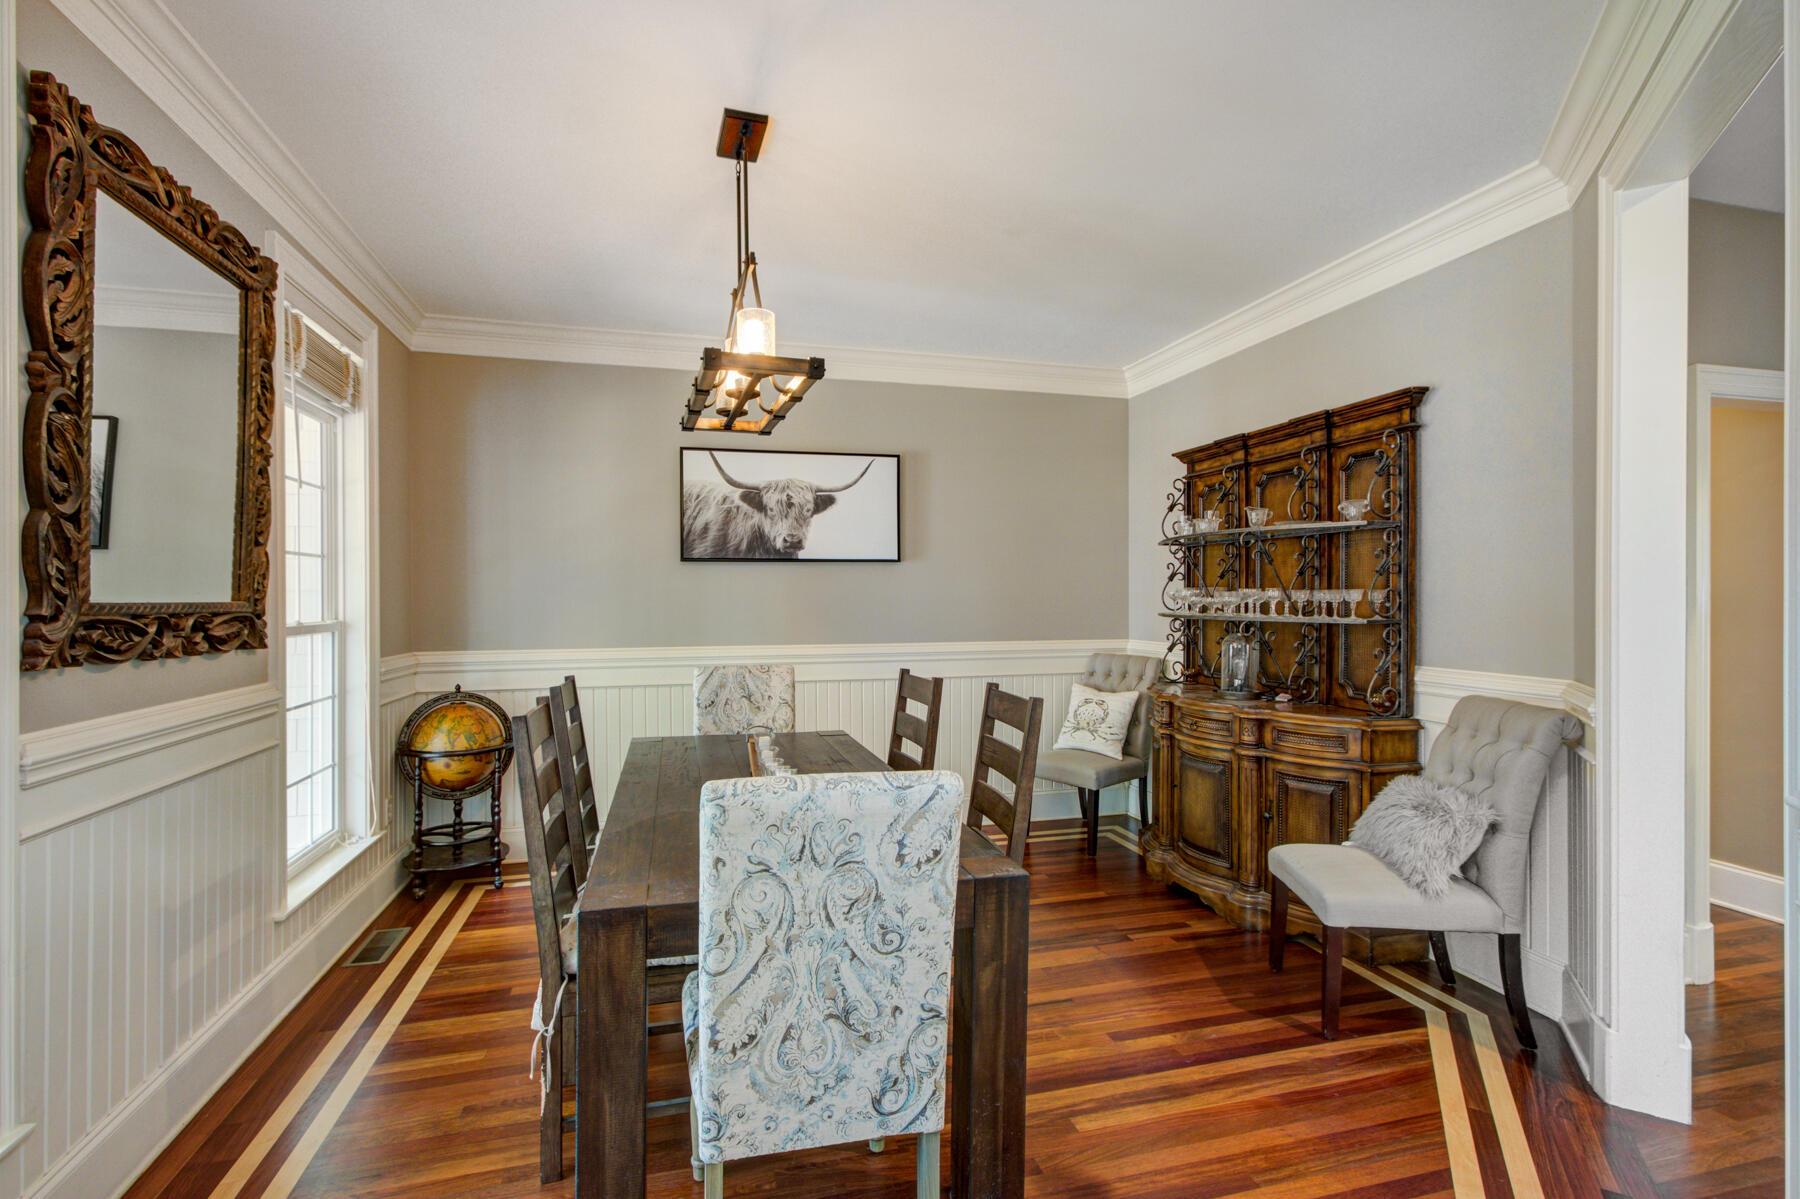 Dunes West Homes For Sale - 3095 Pignatelli, Mount Pleasant, SC - 30